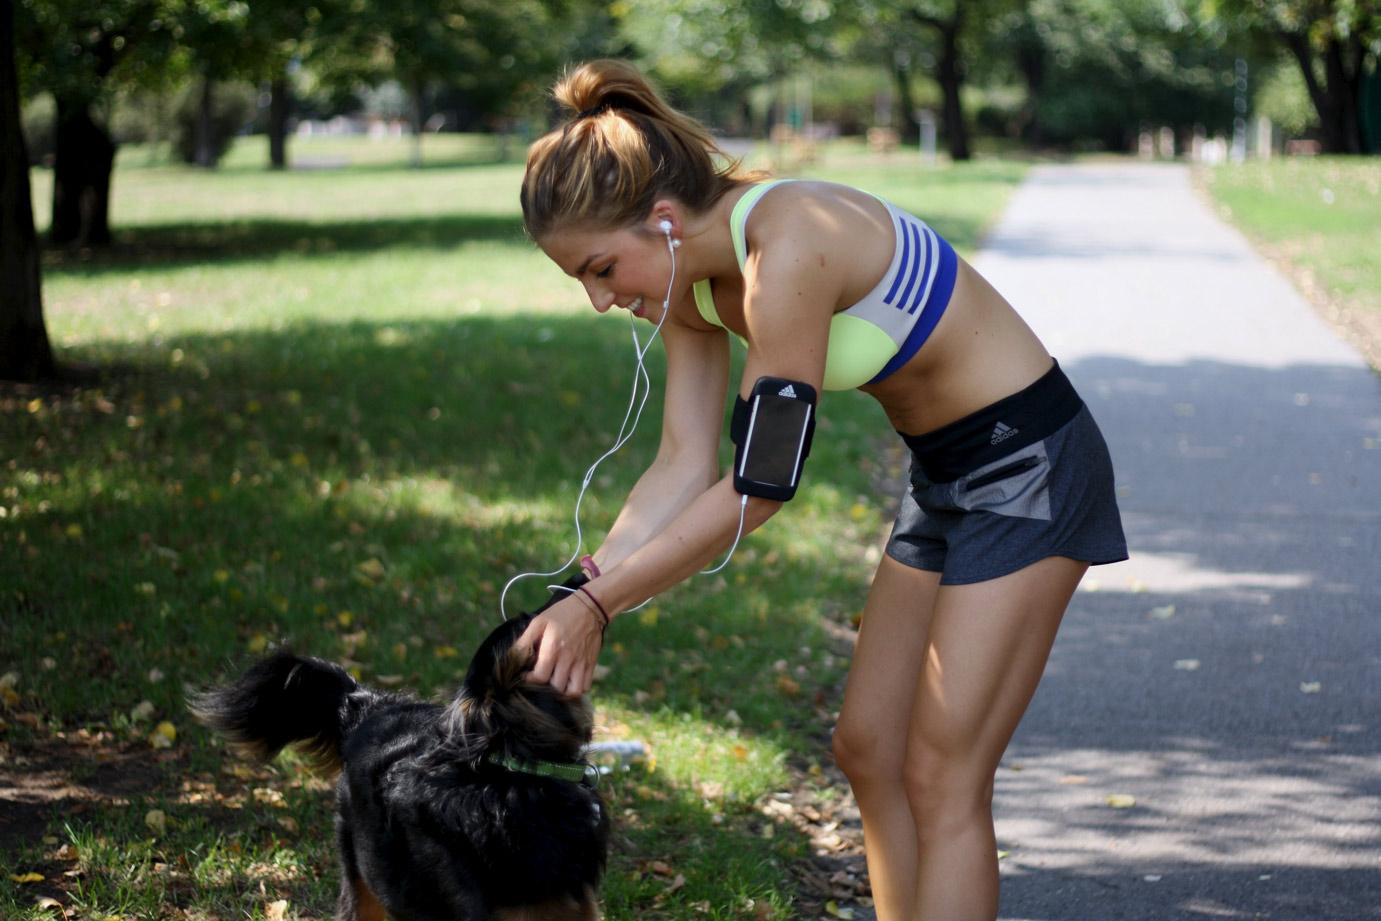 #ADIDASBLOGGERSCHALLENGE - THE BEST RUNNING OUTFIT 4